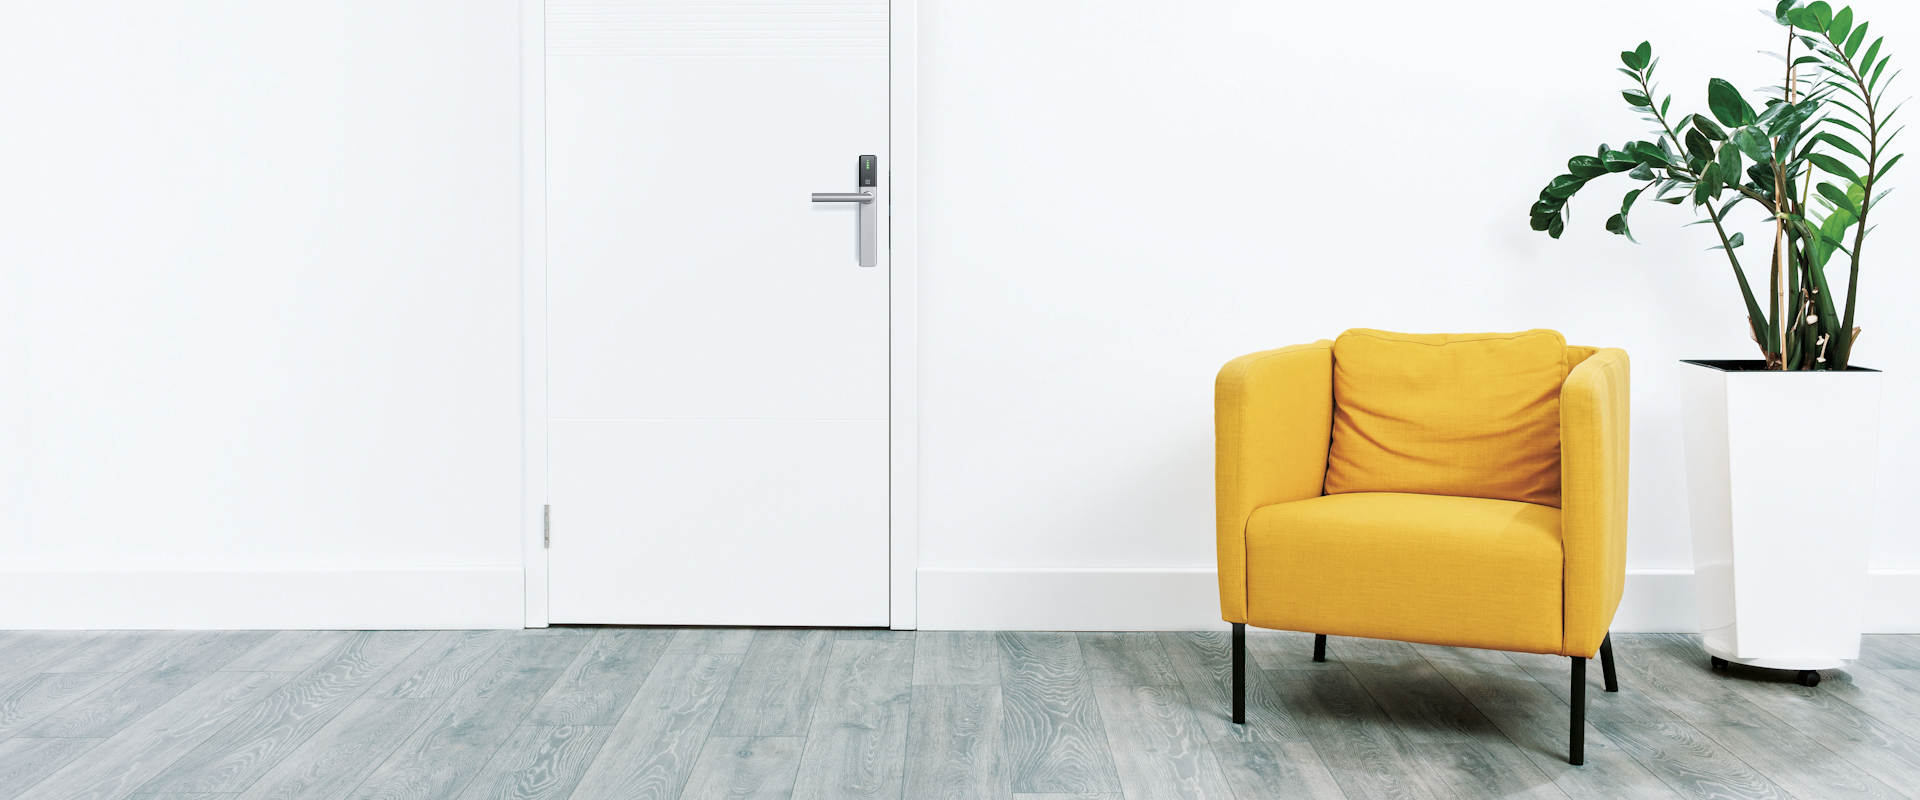 DOM ENiQ Guard digitale deurbeslag